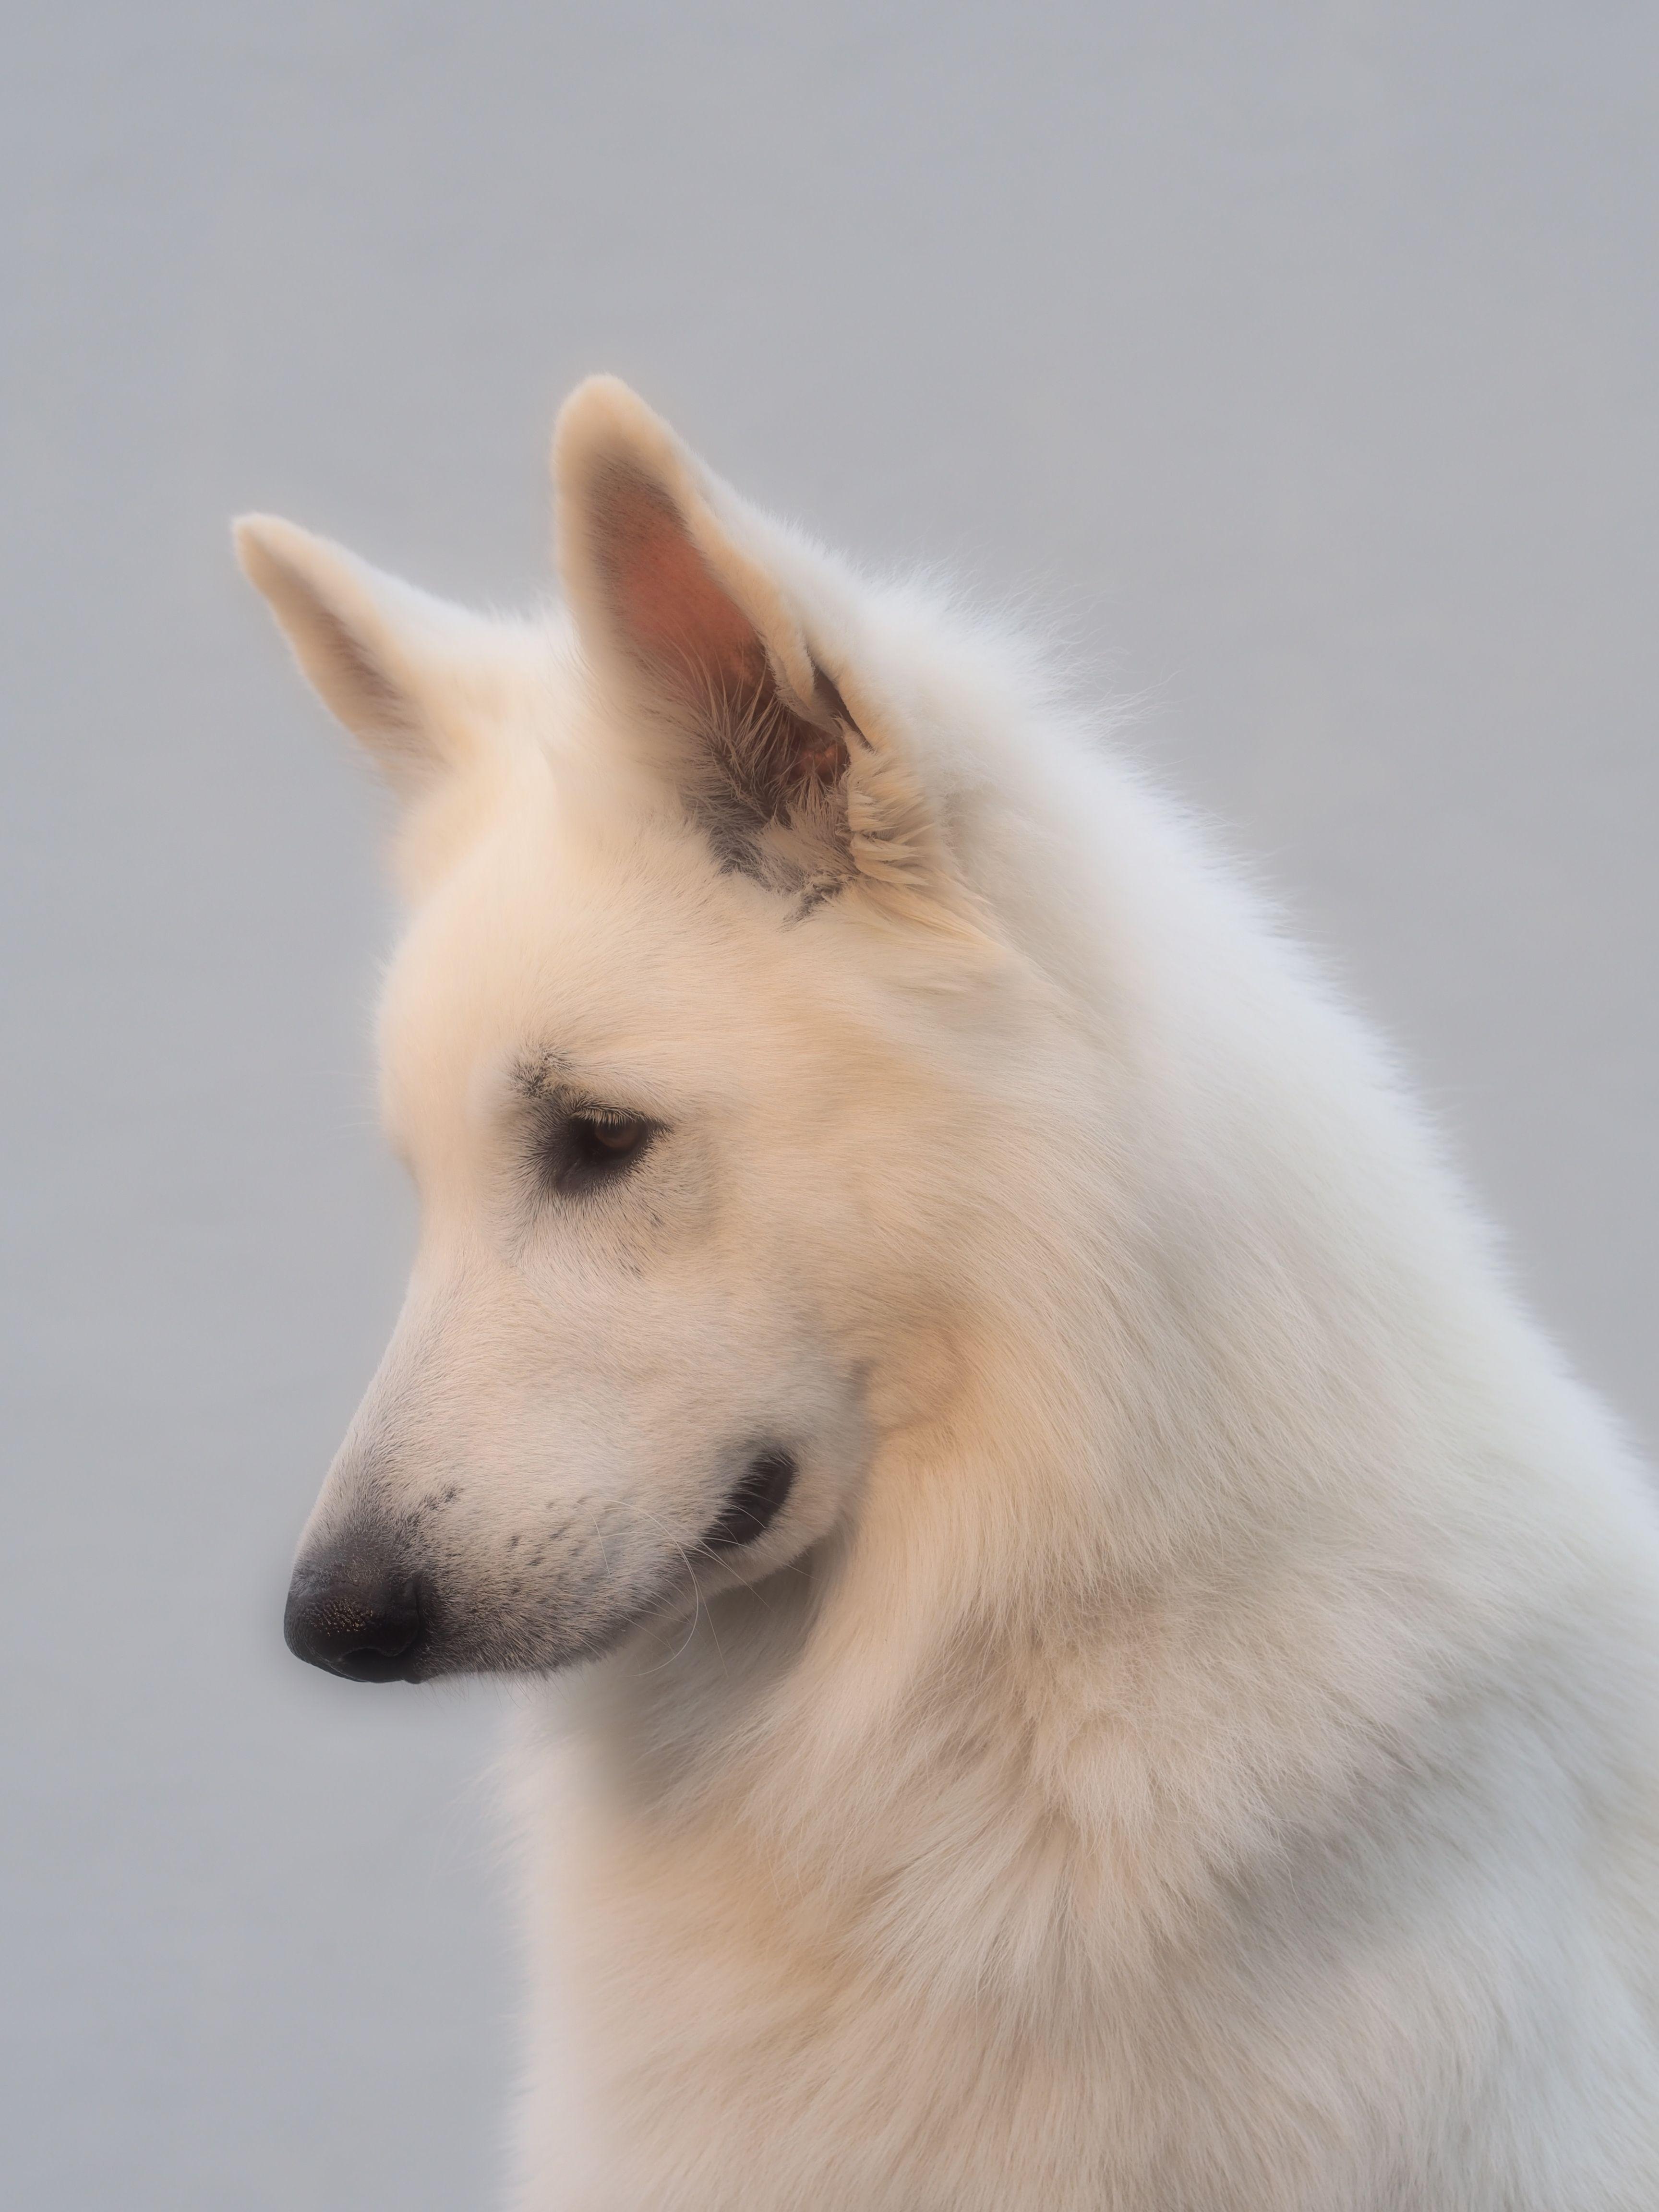 Bandhu Of Shadasa In Soft Focus White German Shepherd German Shepherd Dogs German Shepherd Puppies